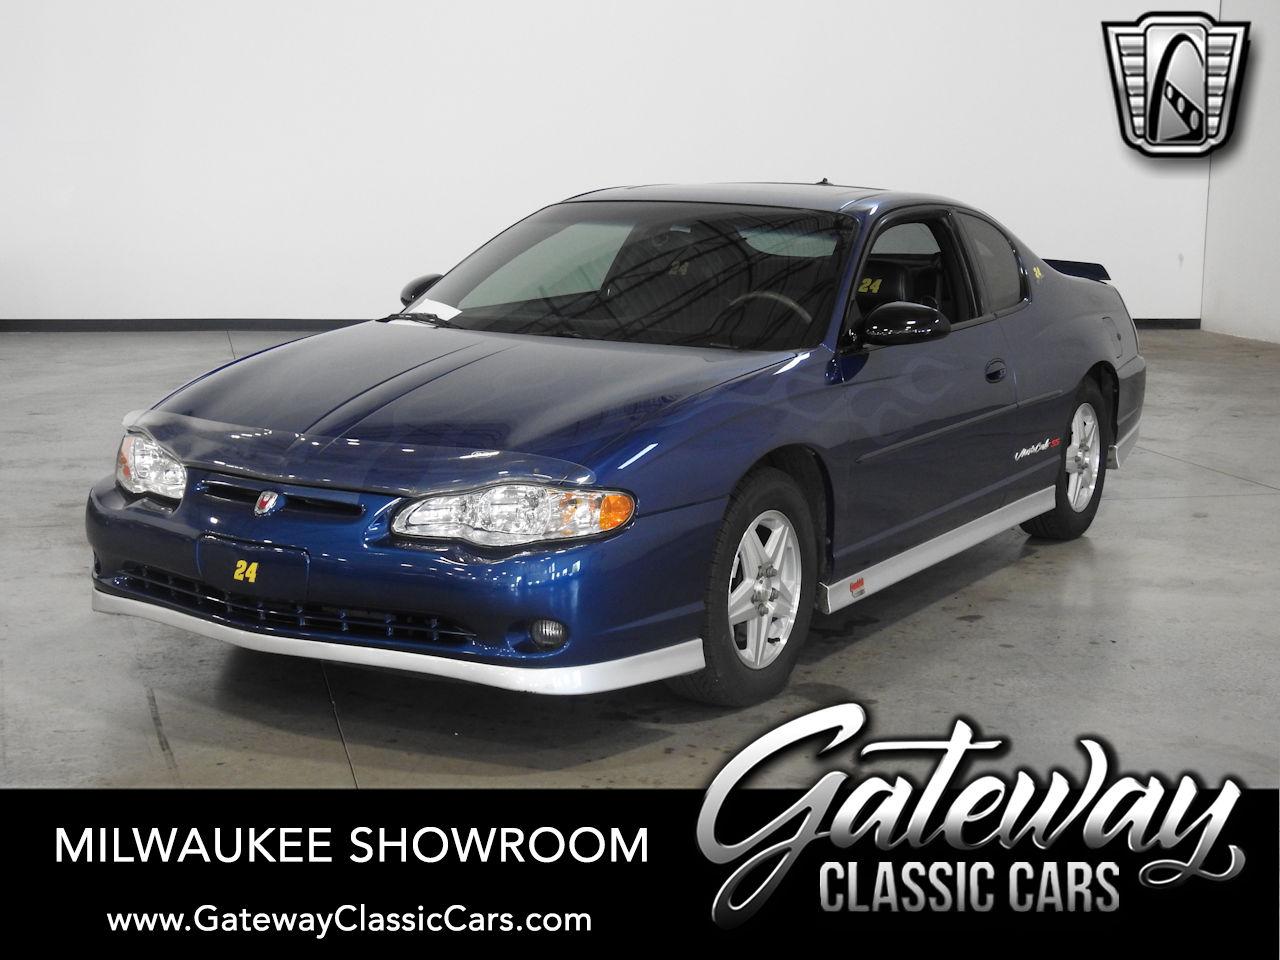 Used 2003 Chevrolet Monte Carlo